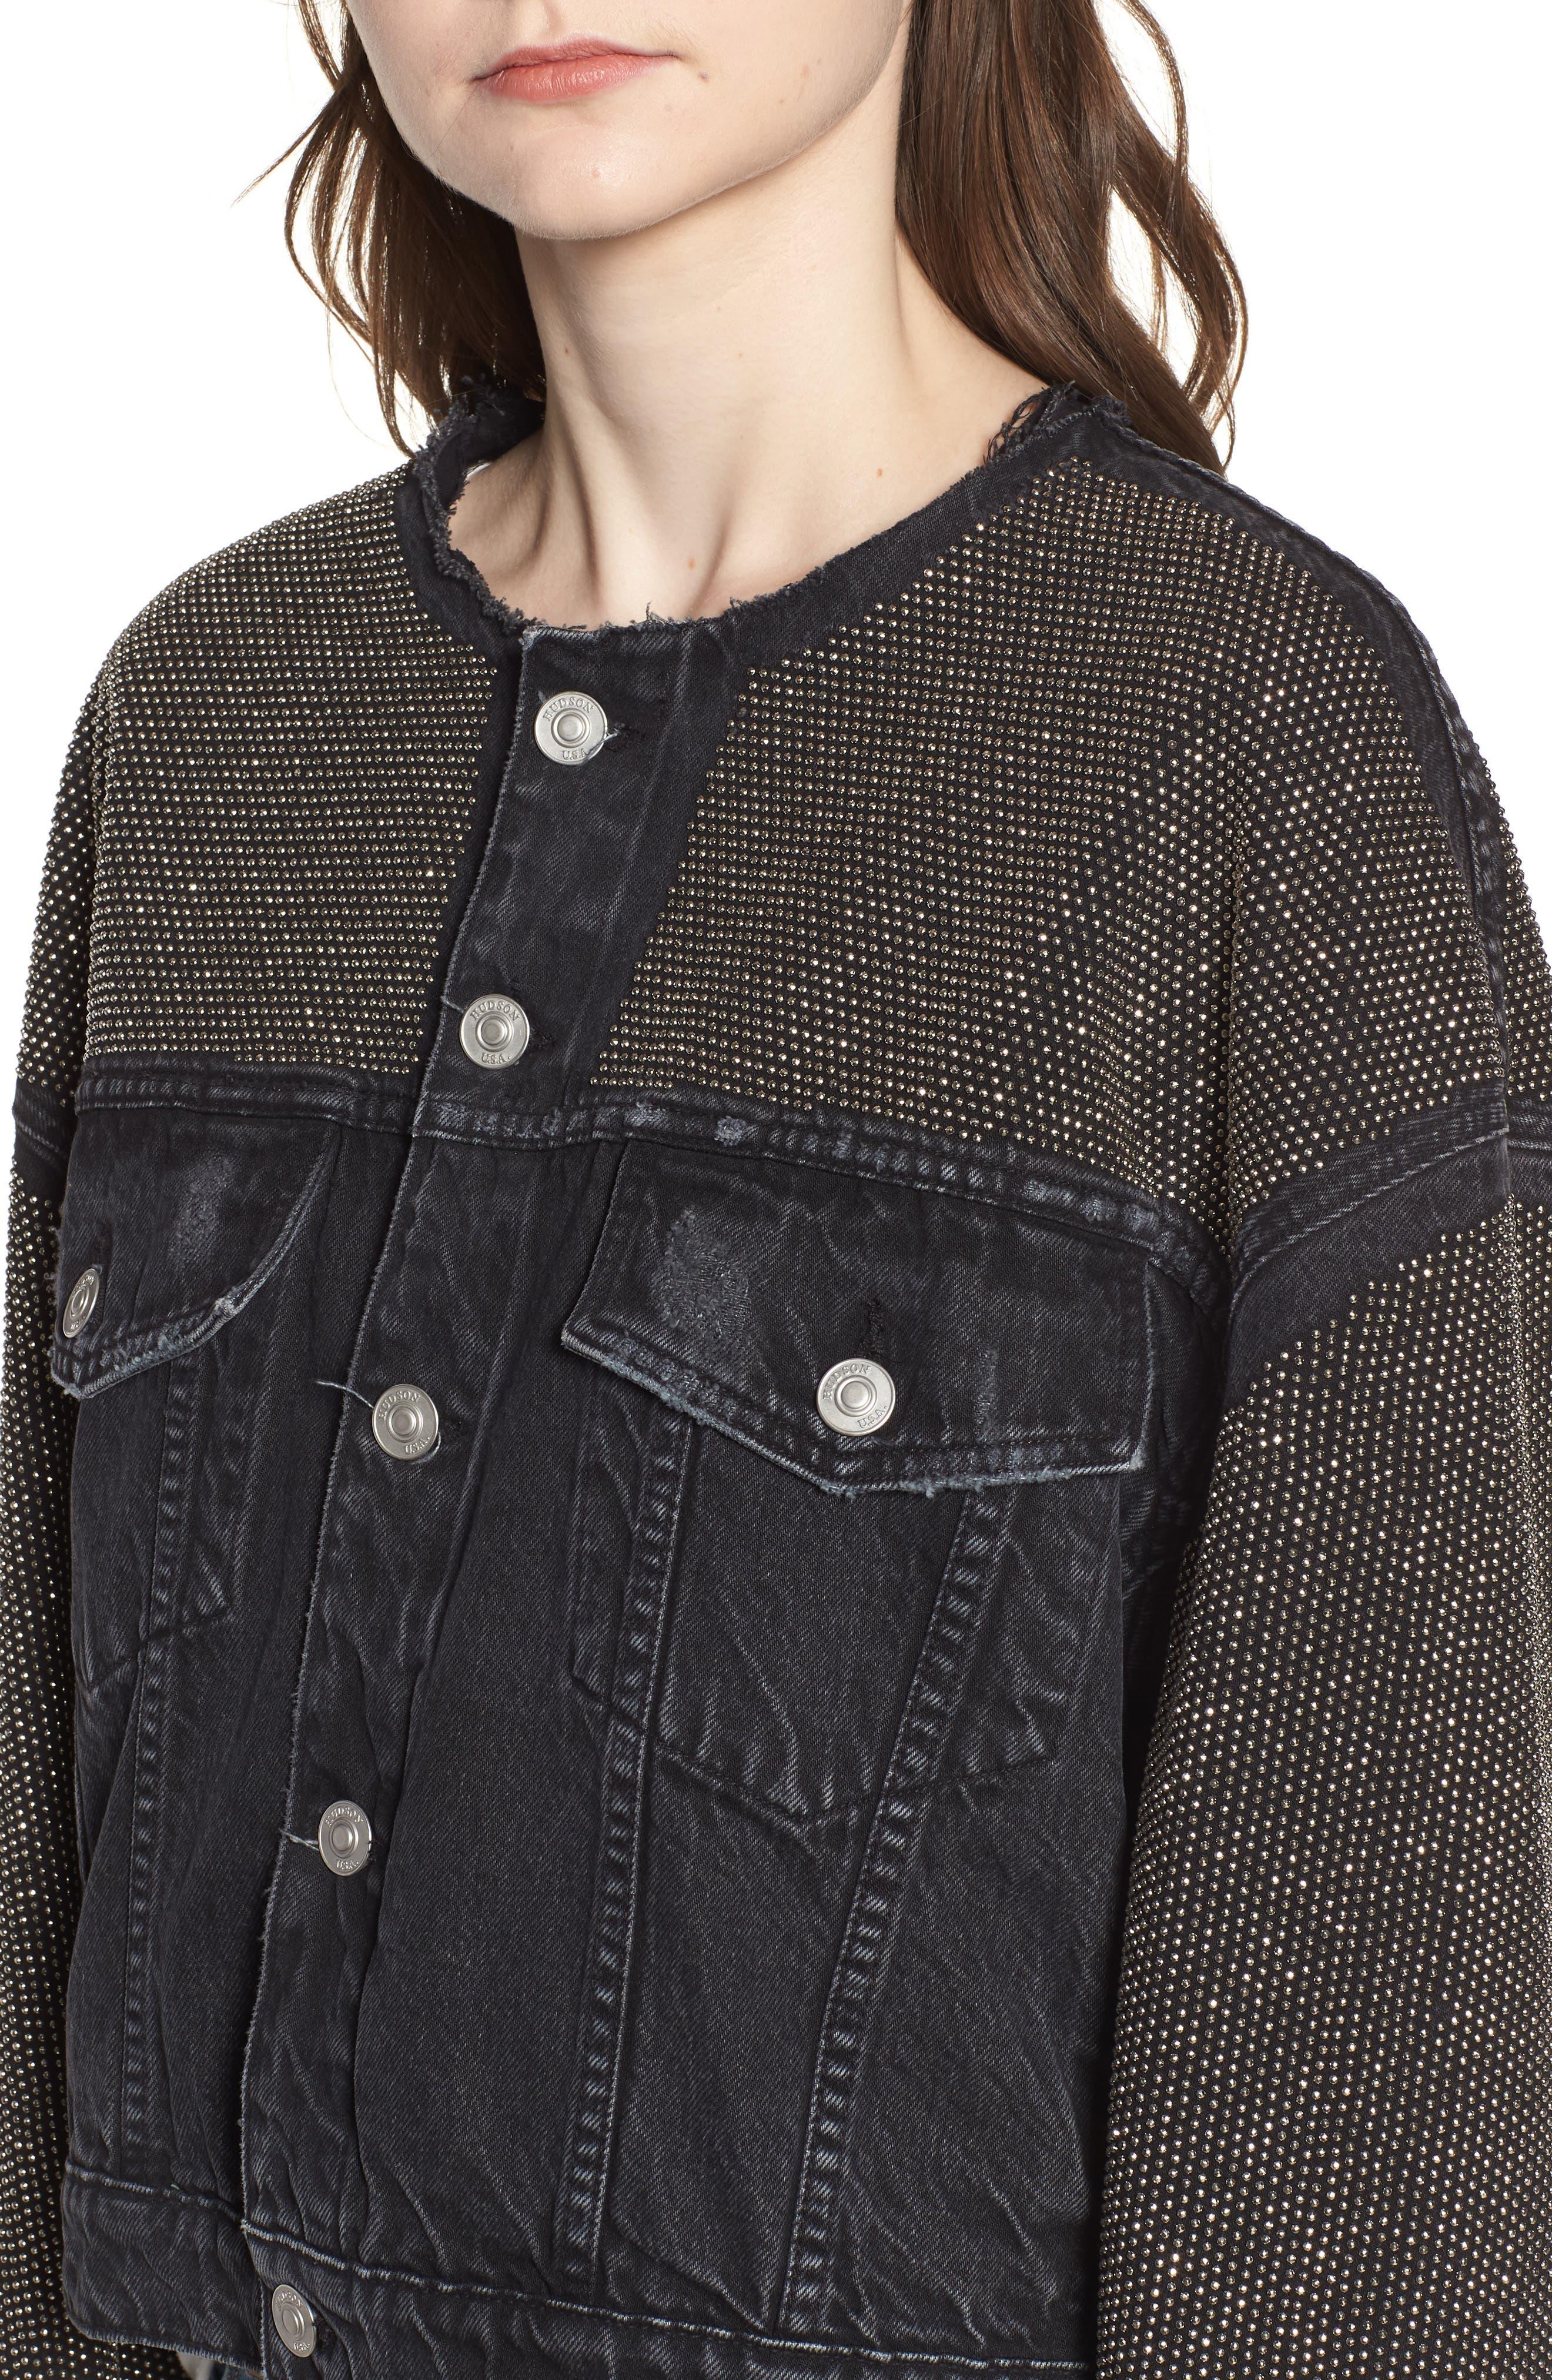 Rei Studded Crop Denim Jacket,                             Alternate thumbnail 4, color,                             Bullet Proof